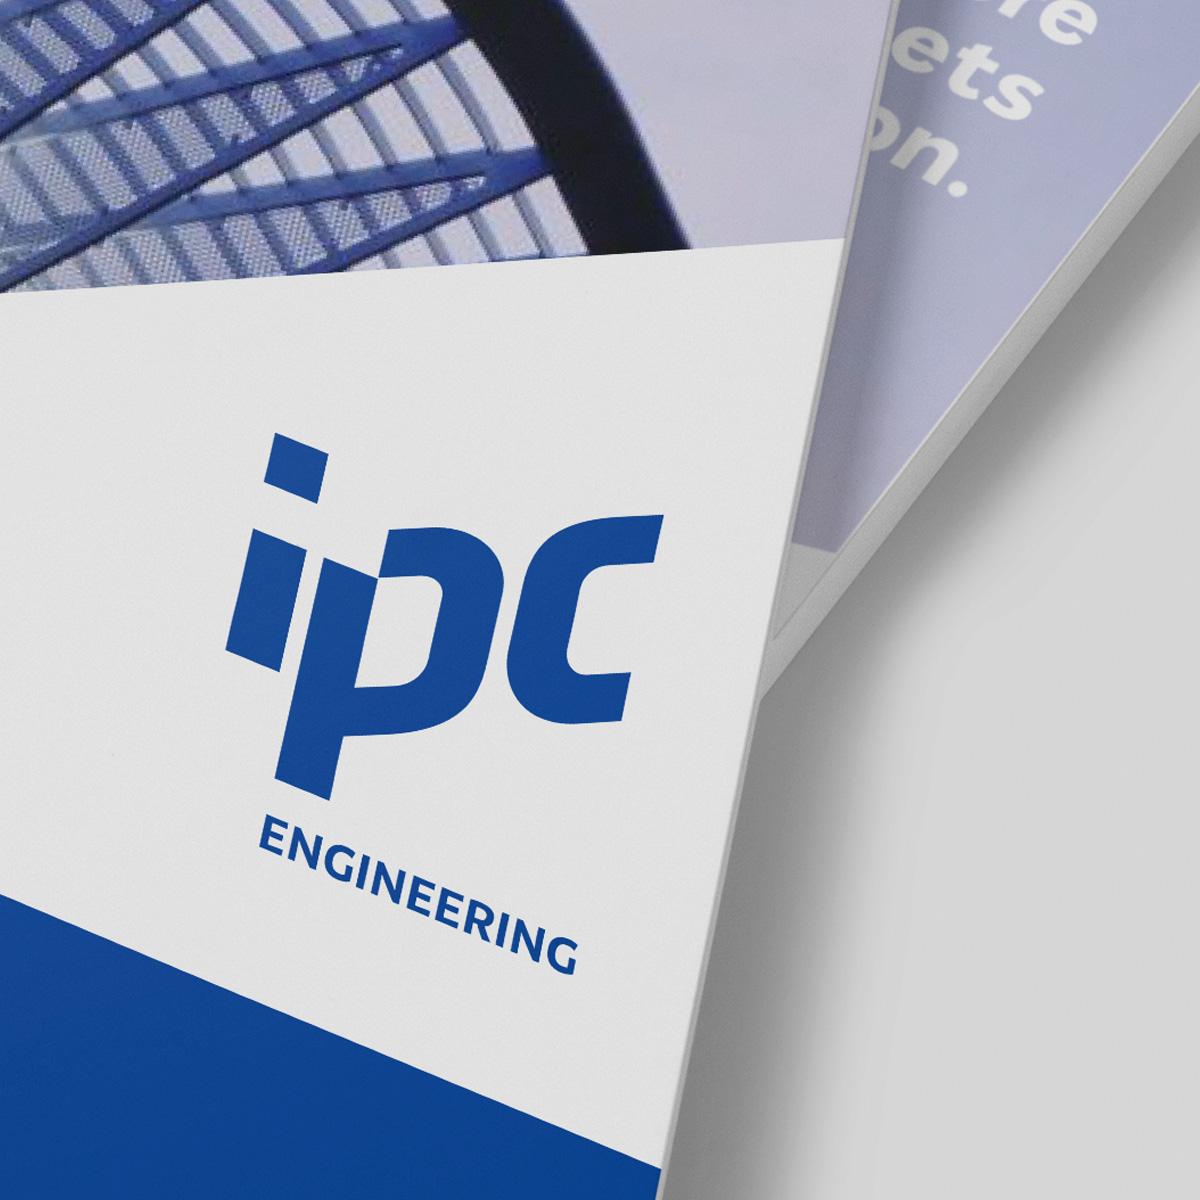 IPC Engineering